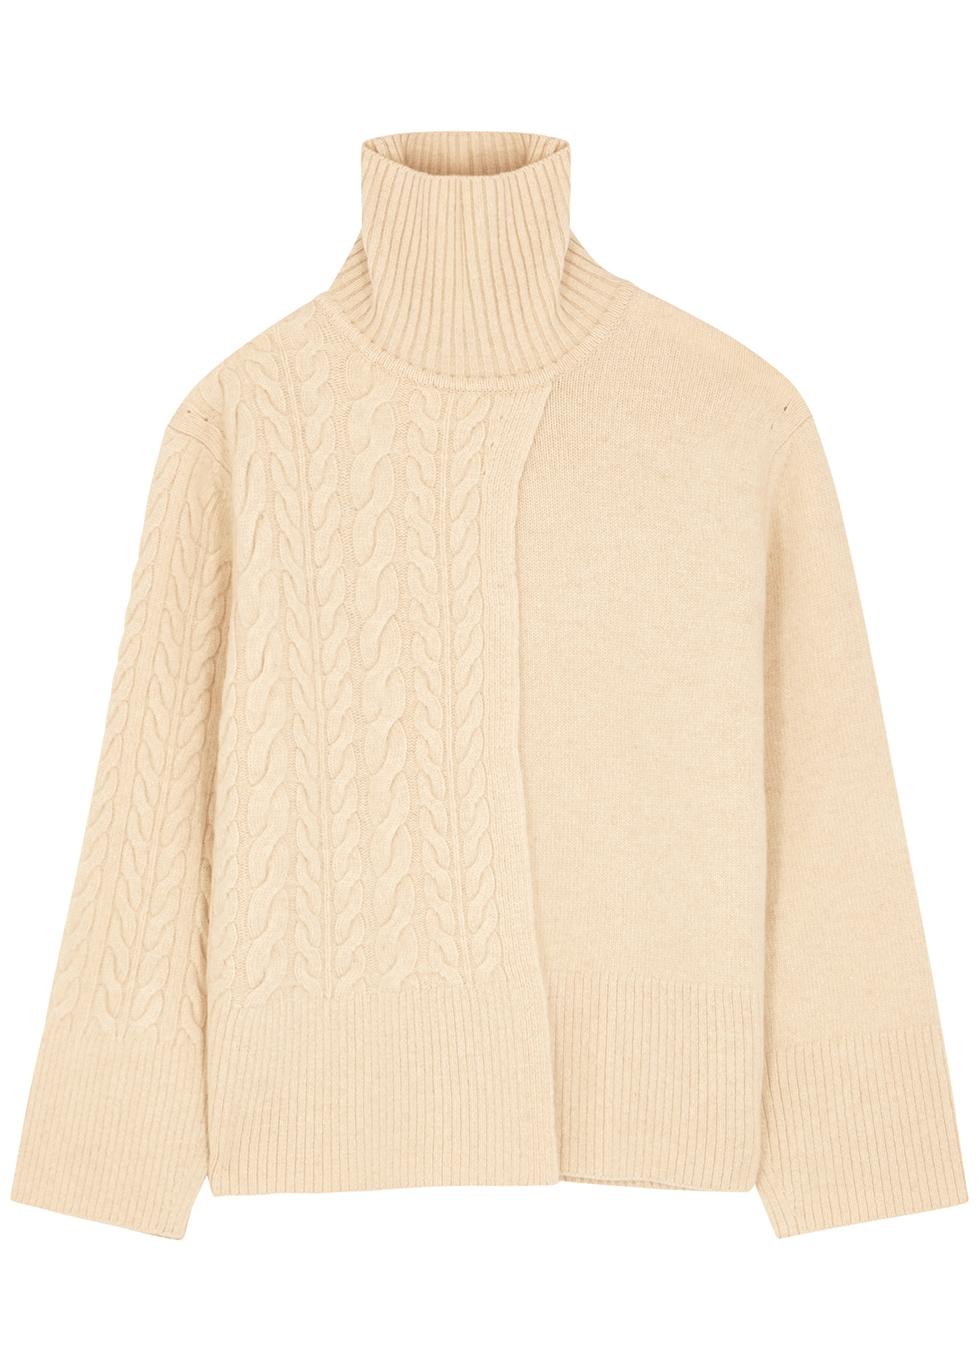 Jess cream wool-blend jumper